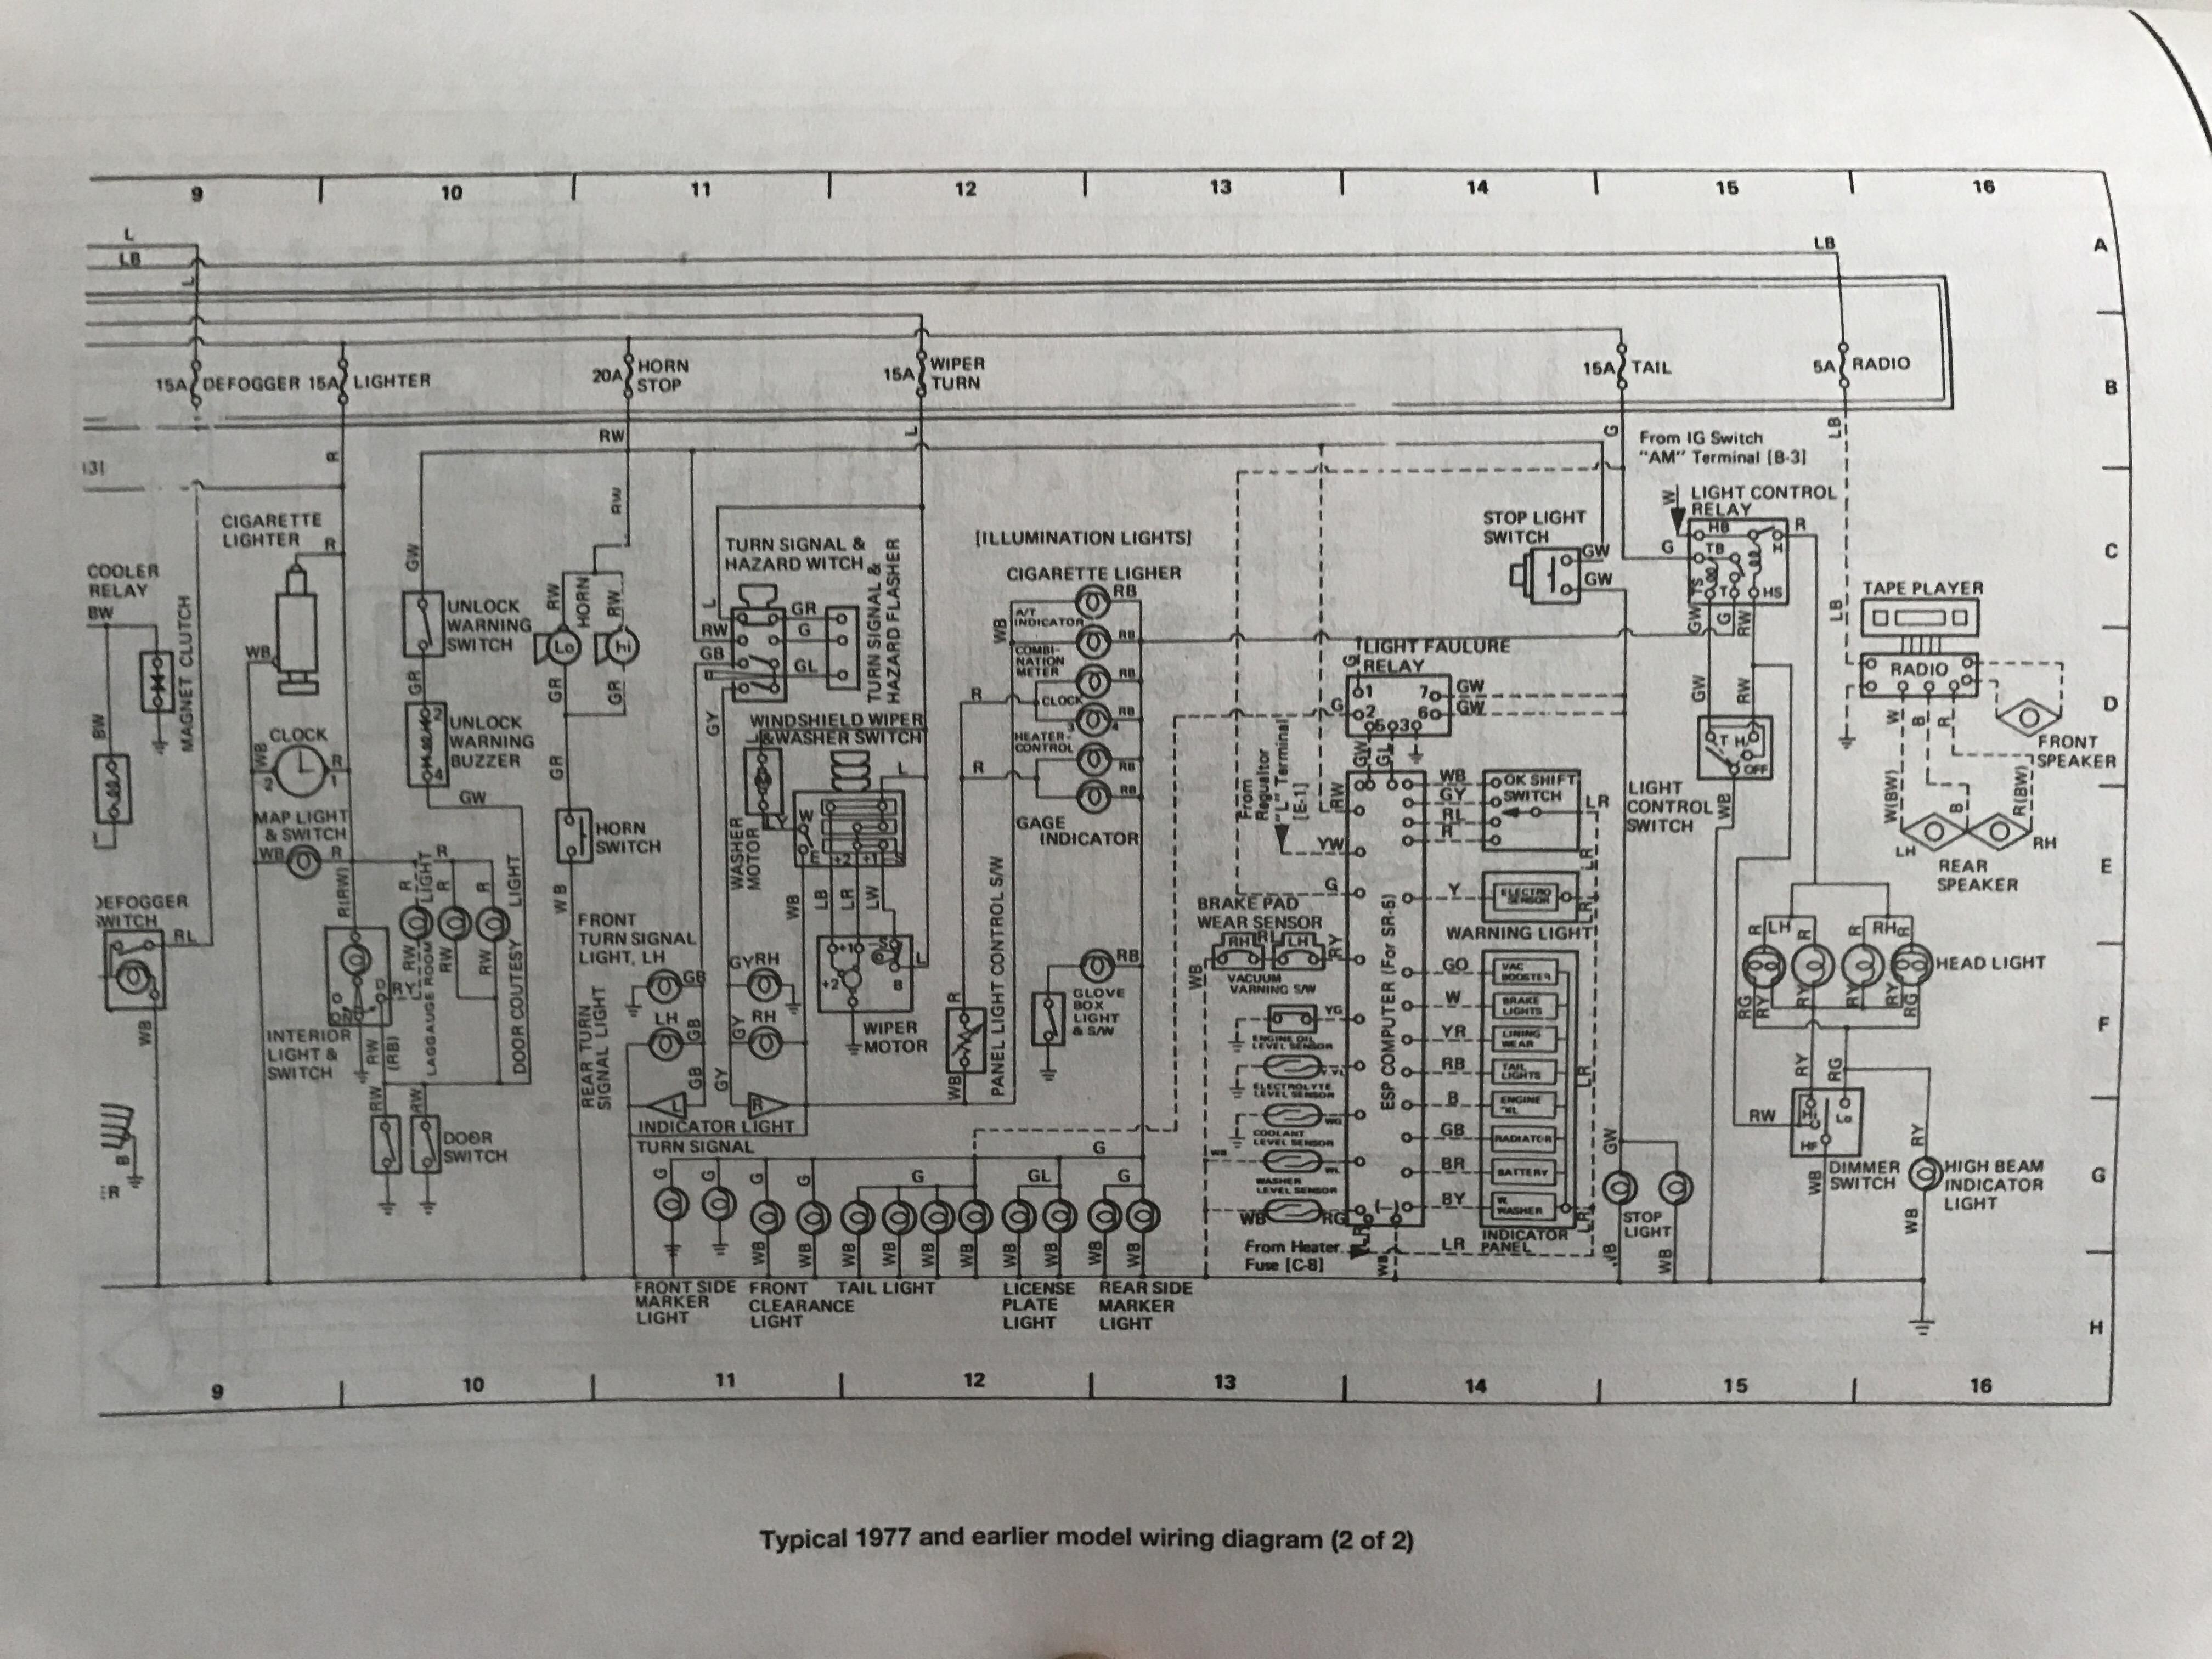 appradio 2 wiring diagram new era relay for spotlights tech docs bluetwentyeight ra28 celica restoration